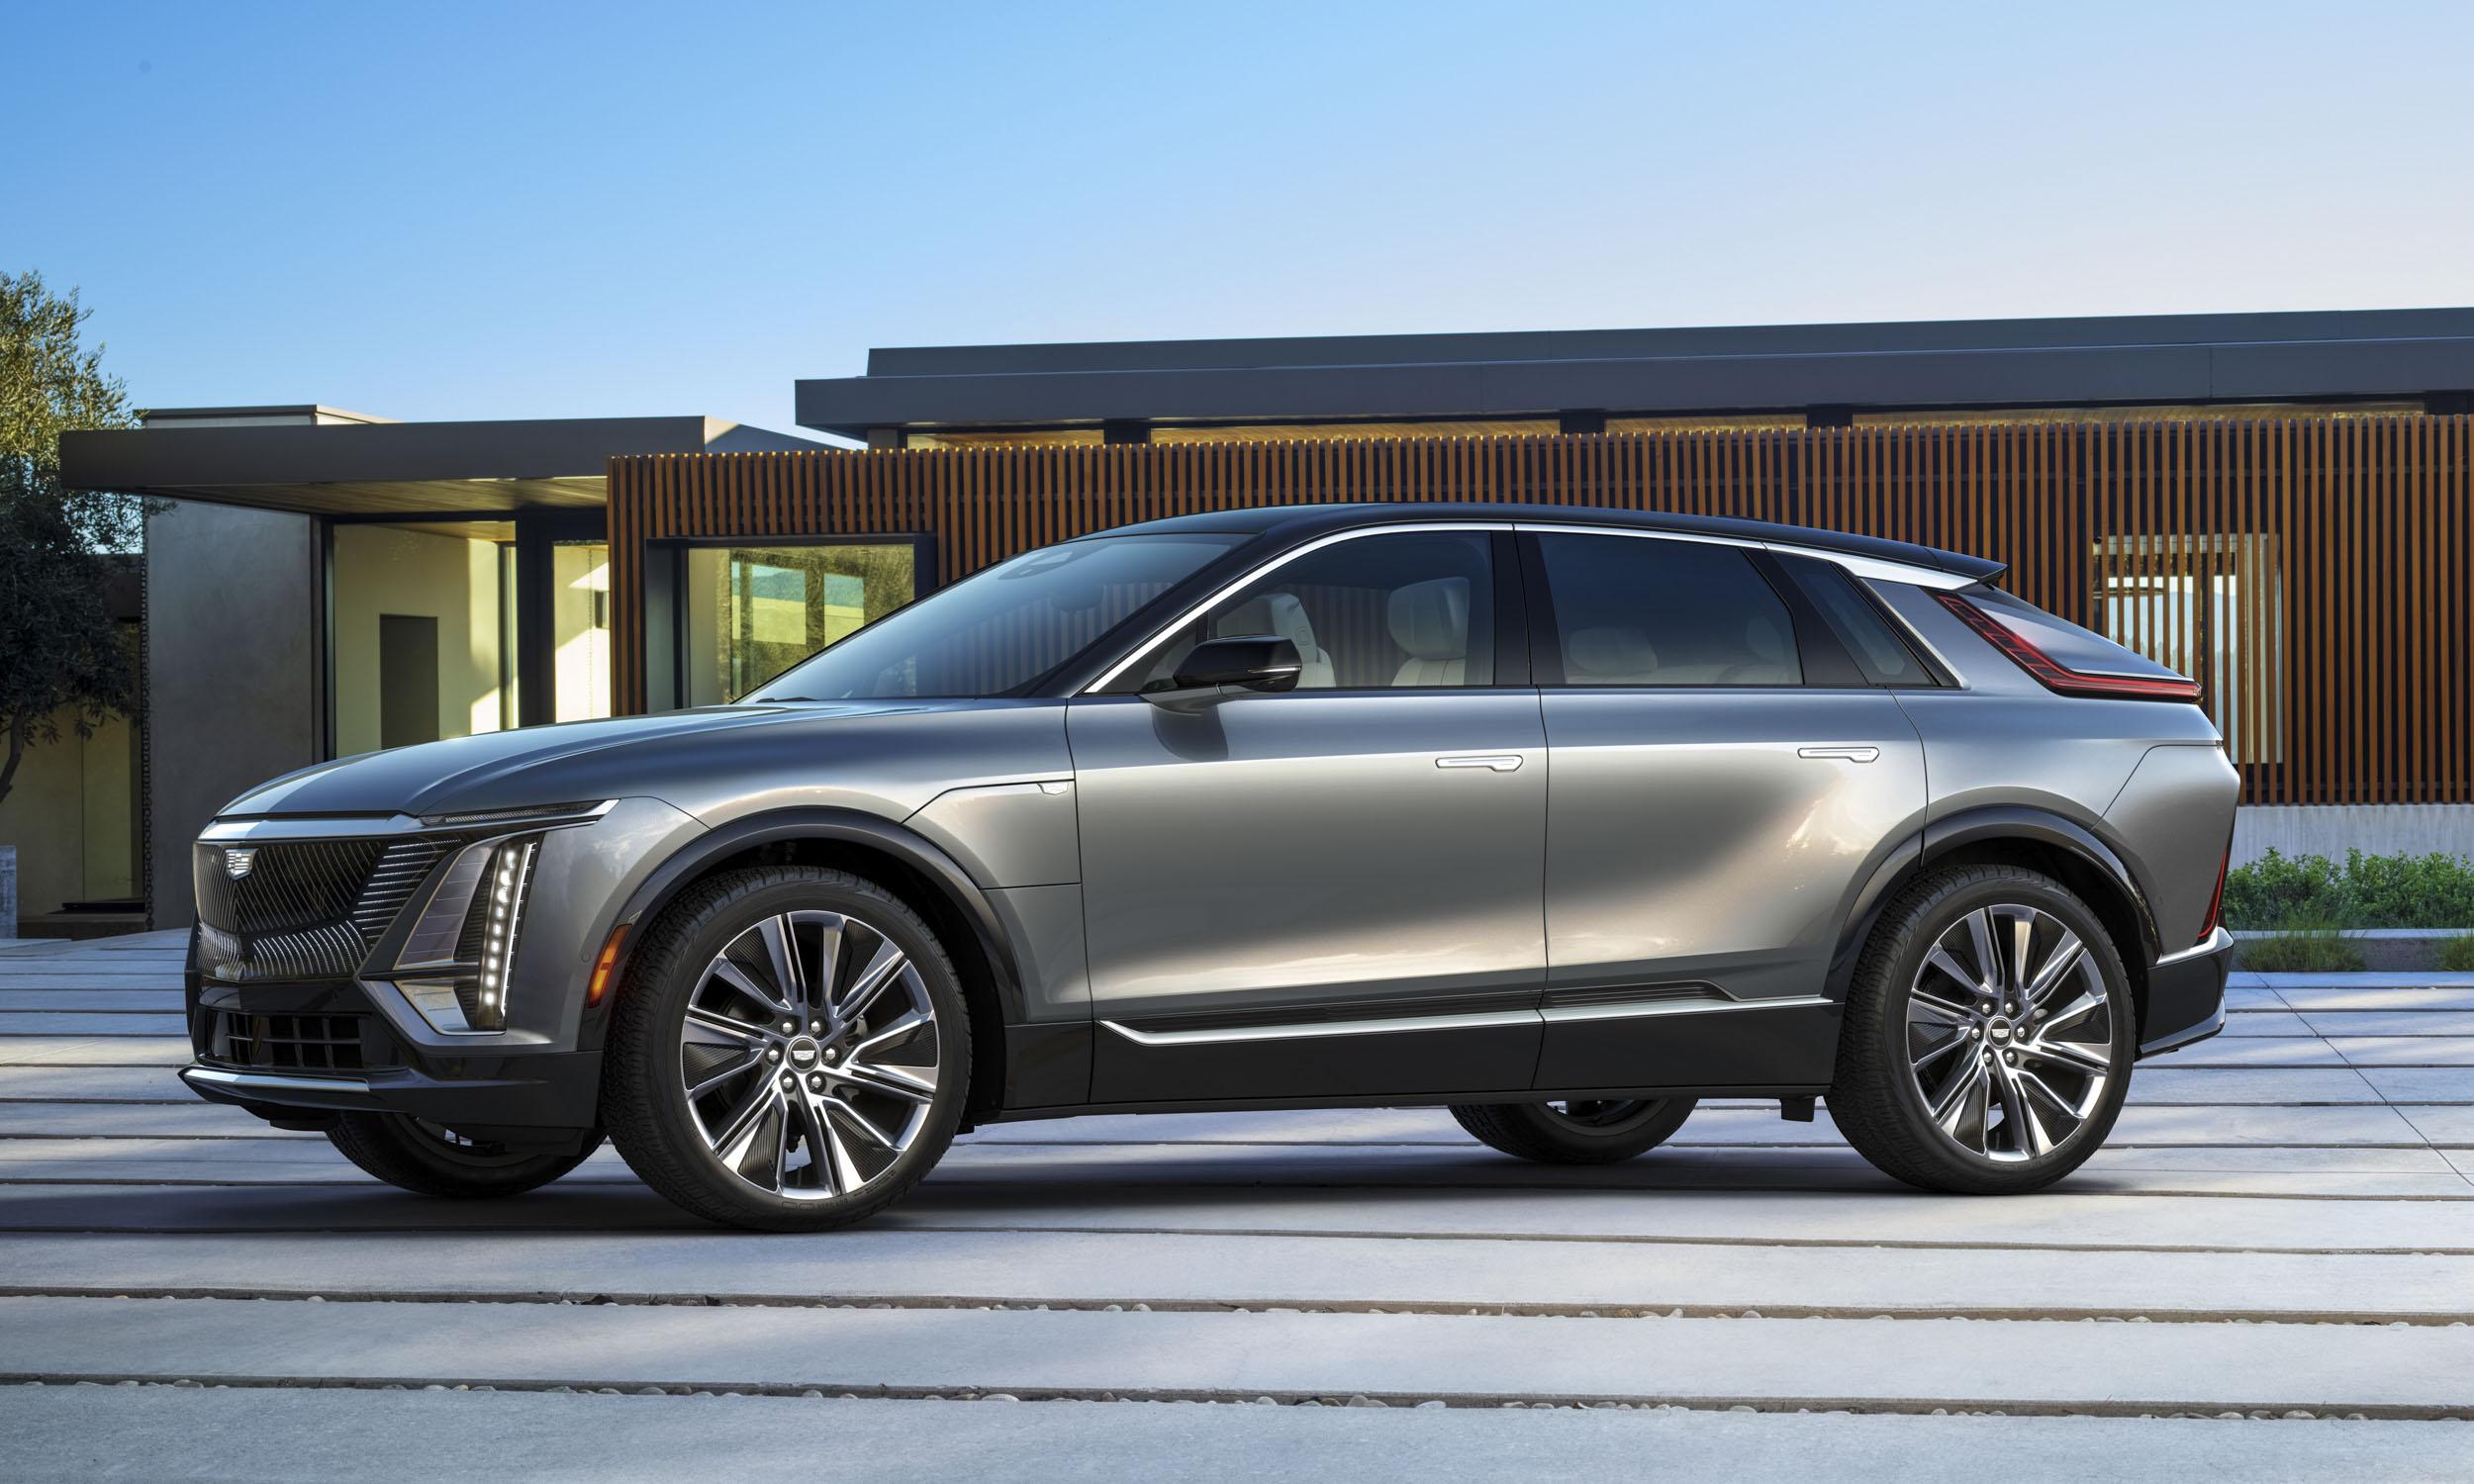 2023 Cadillac LYRIQ: First Look